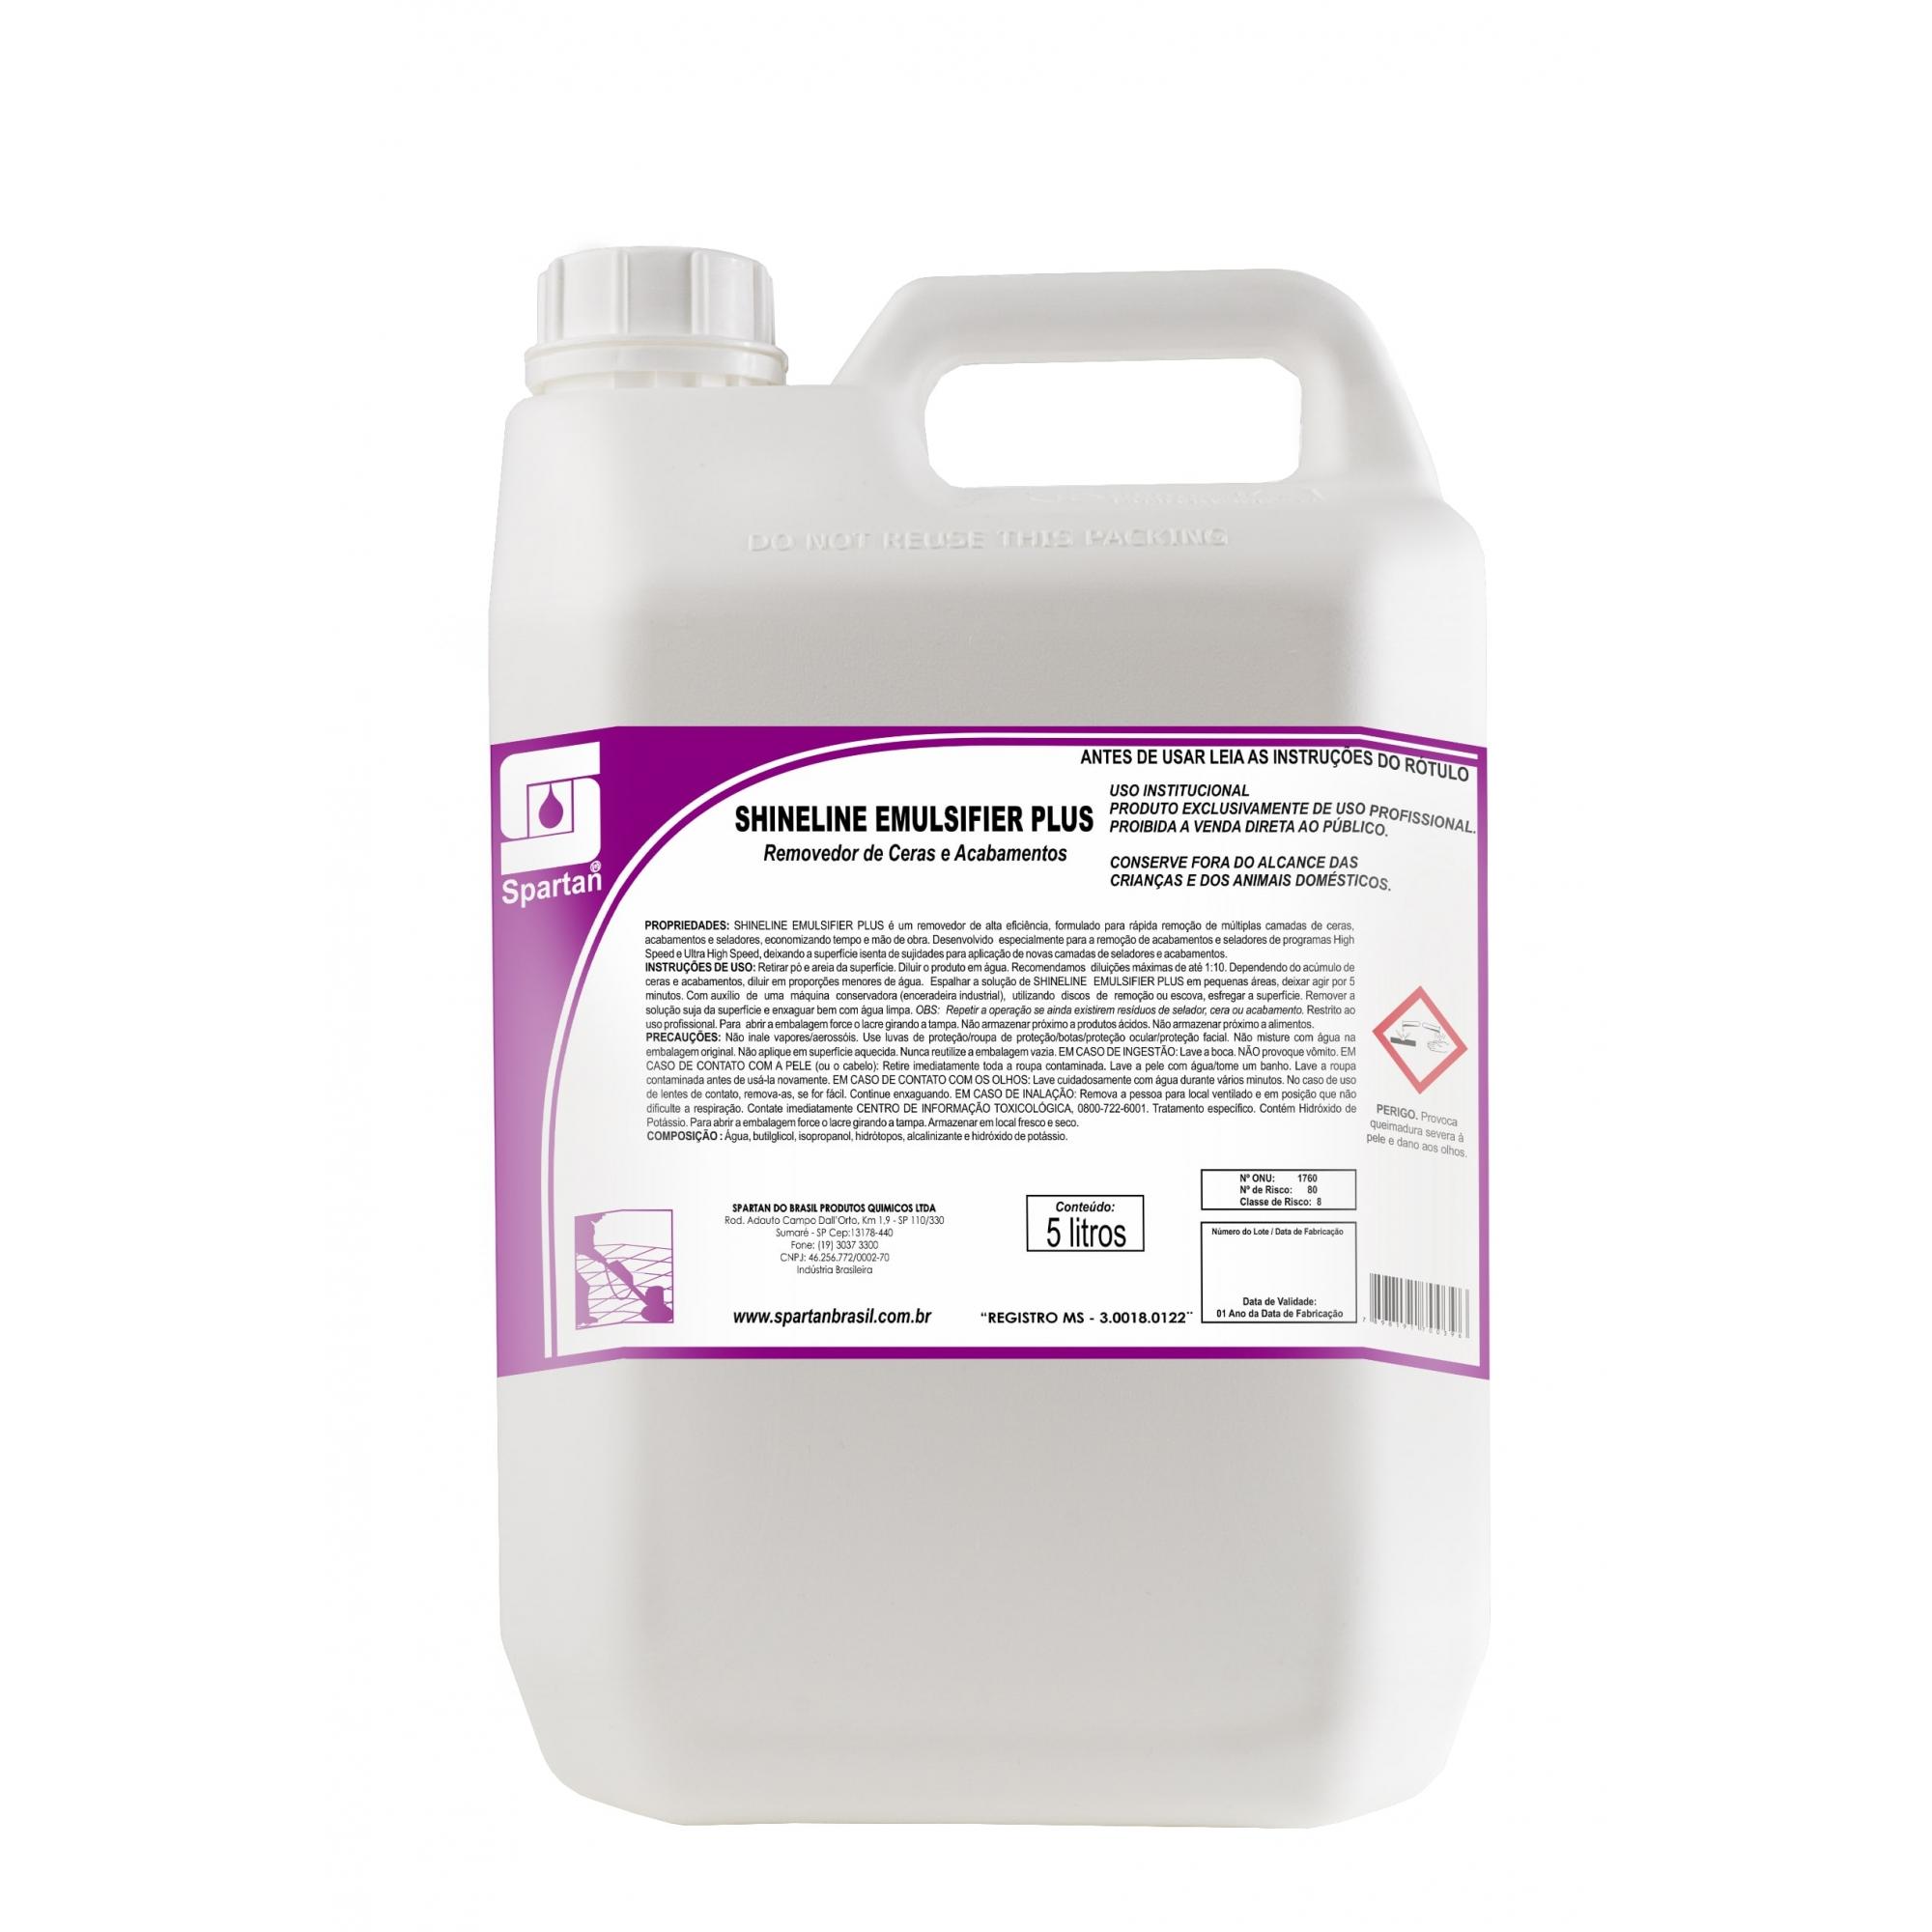 Shineline Emulsifier Plus Removedor 5 Litros Spartan  - Higinet